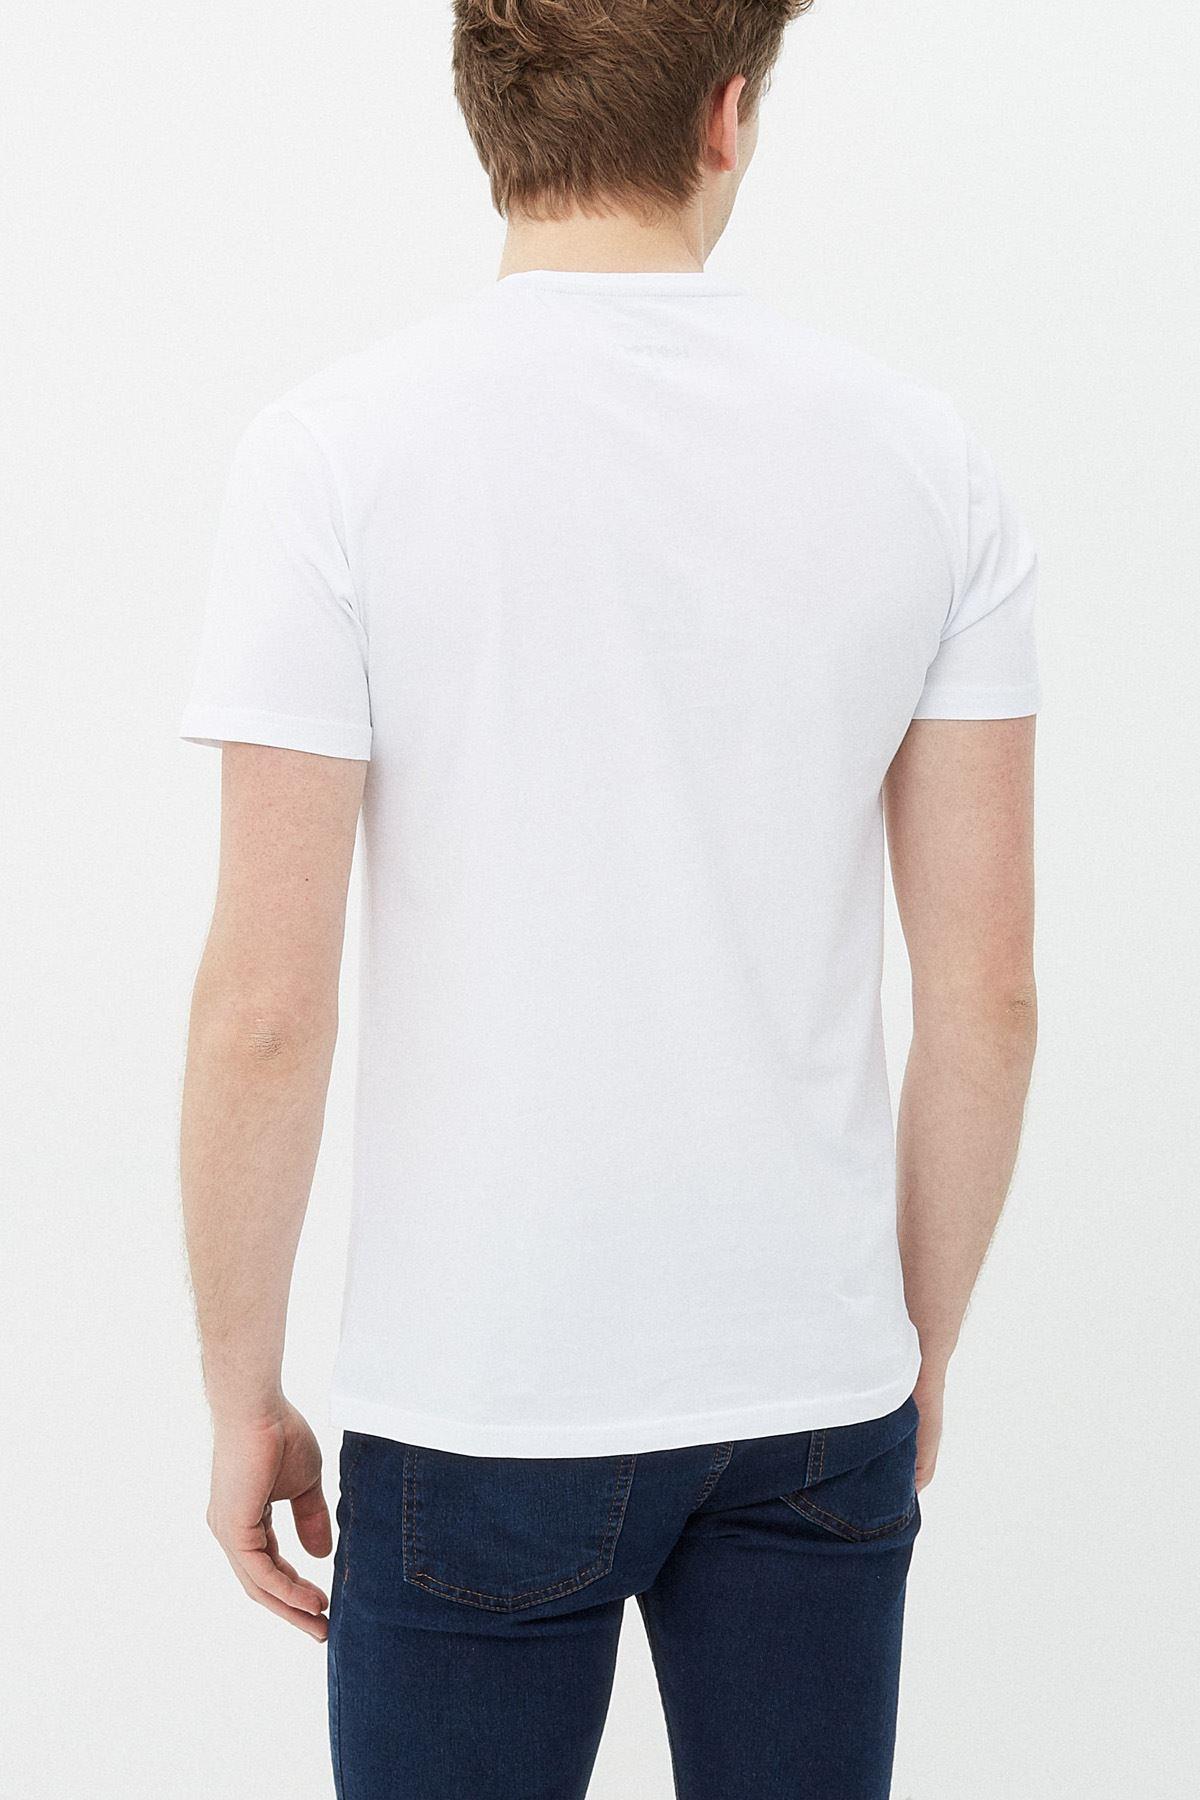 Anime Monkey 02 Beyaz Erkek Tshirt - Tişört